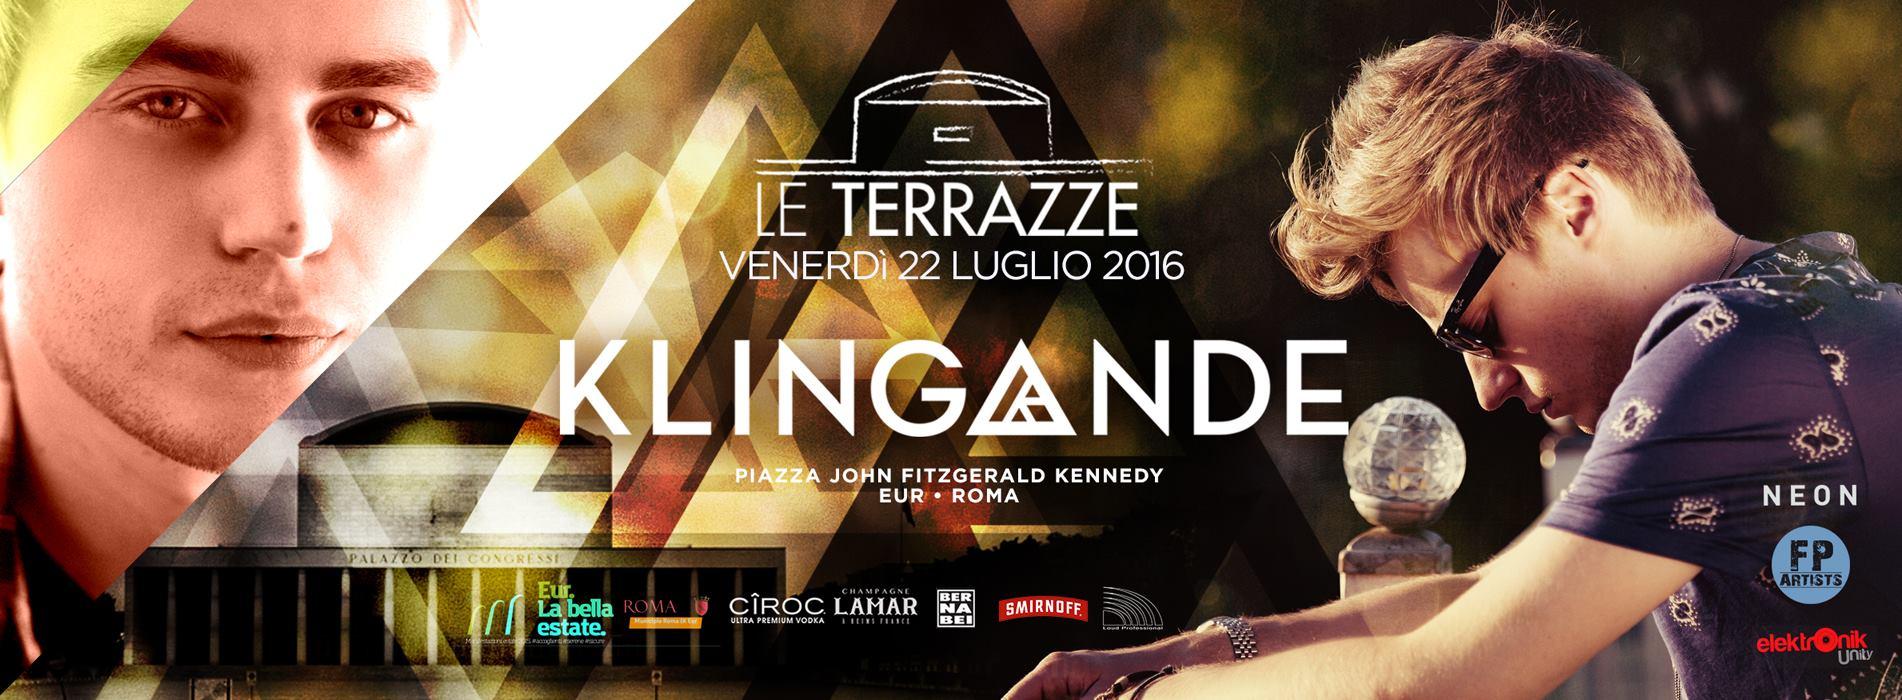 Klingande Le Terrazze Roma 22 07 2016